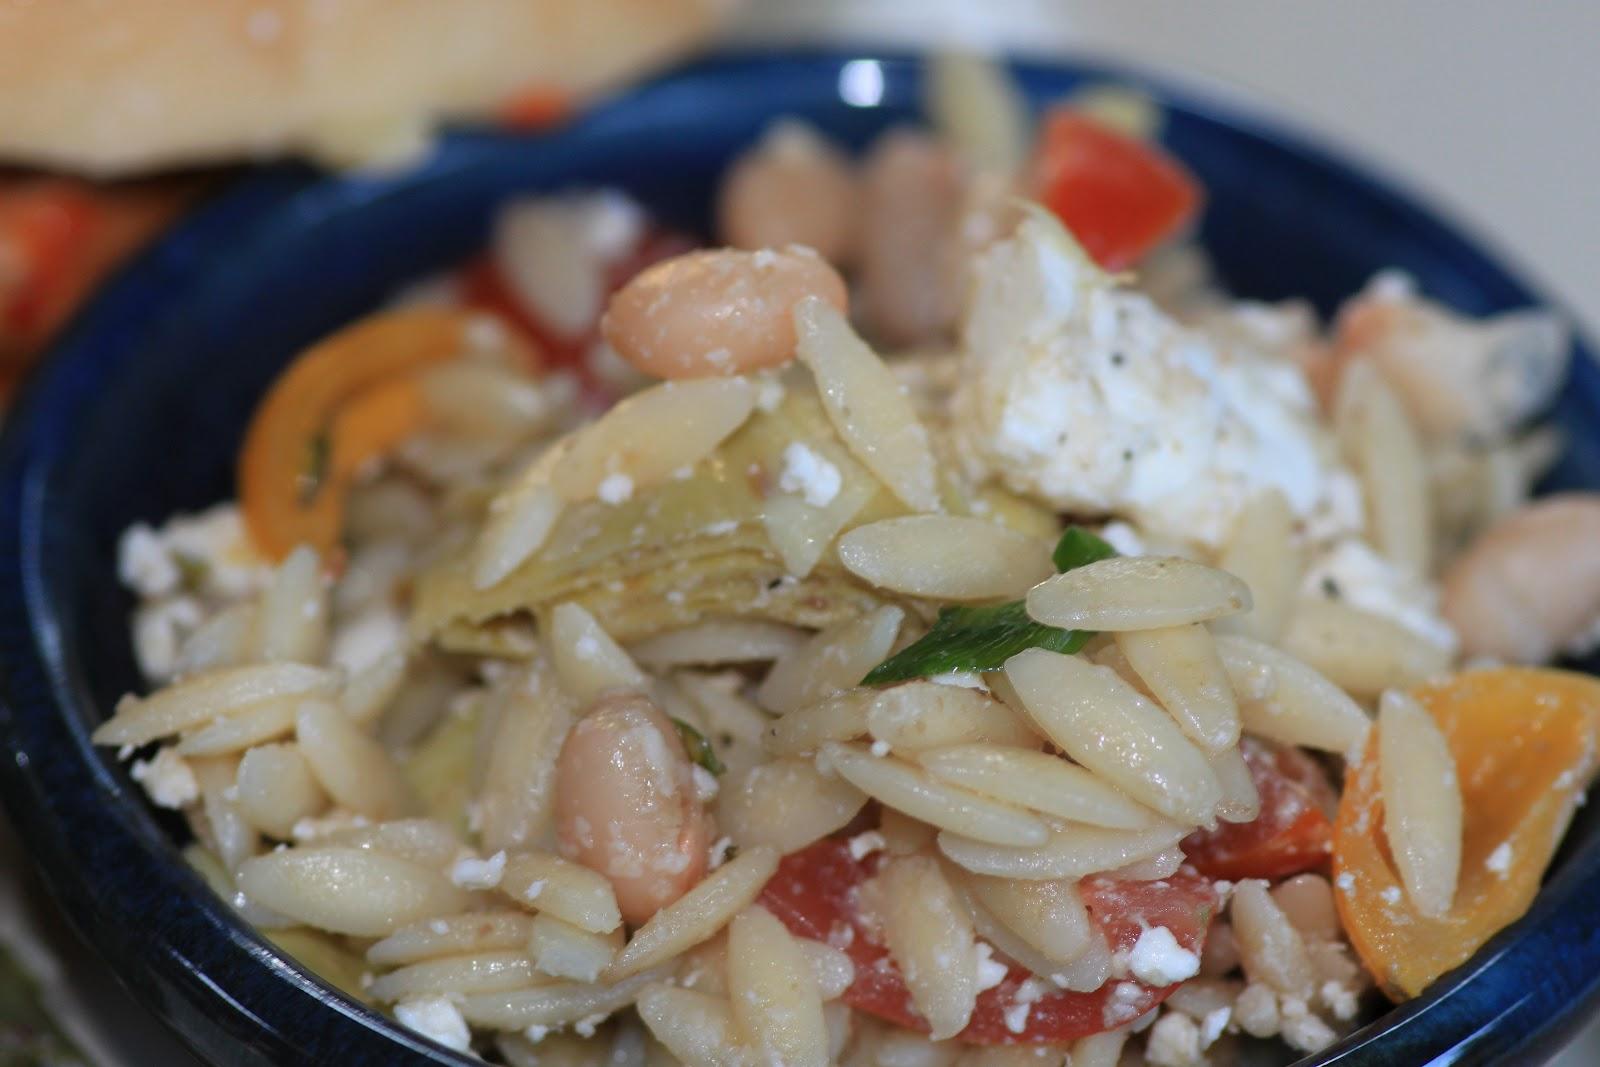 Beauties and the Feast:: Turkey & Artichoke Panini